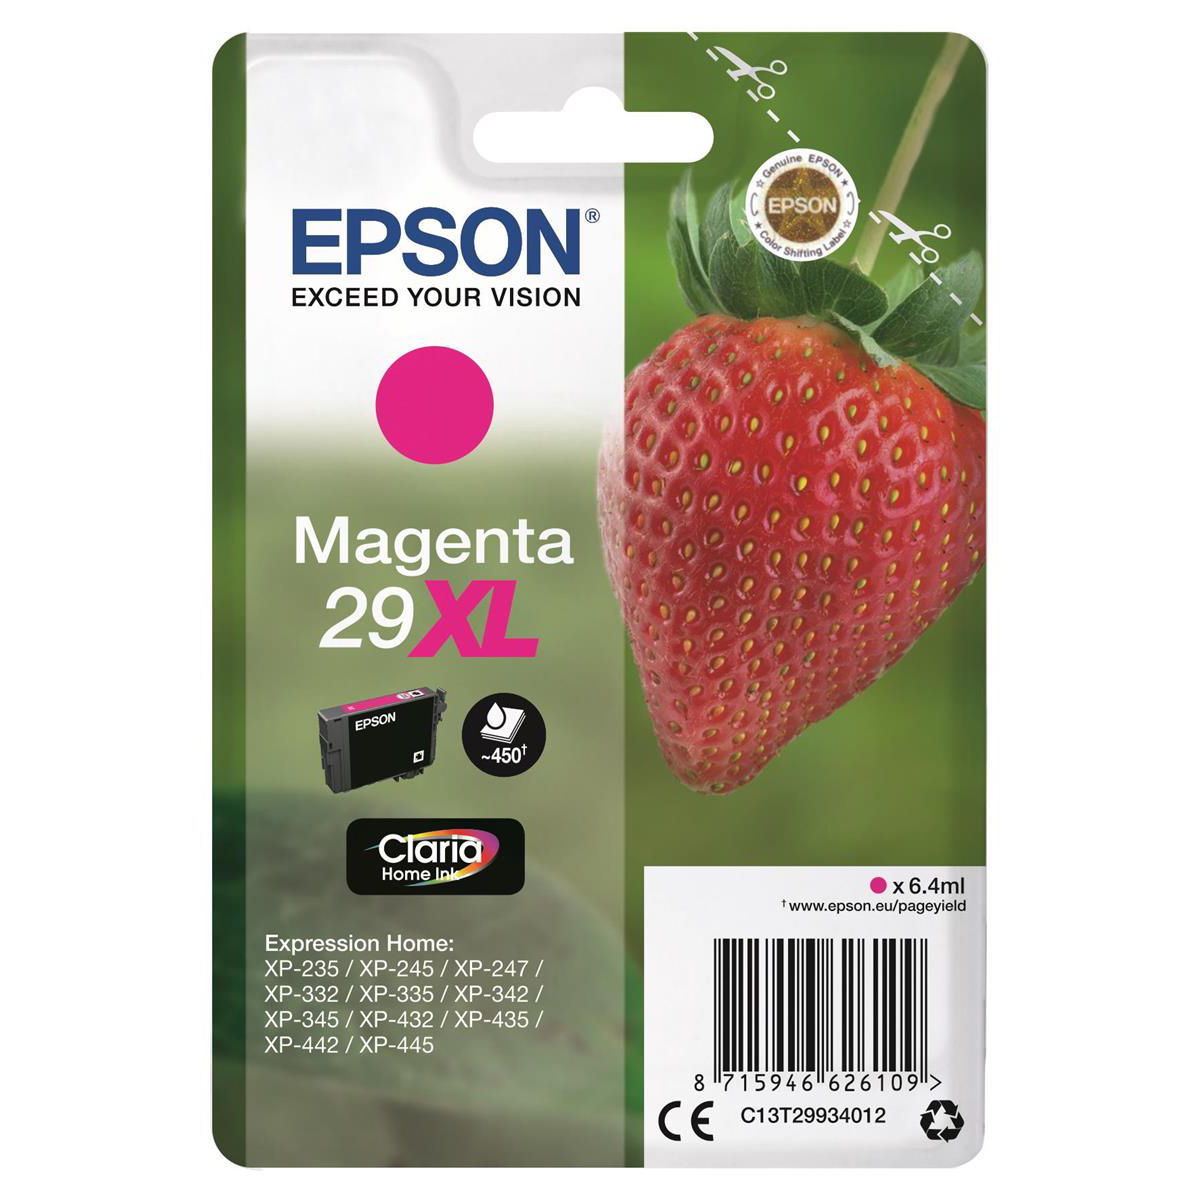 Epson 29XL InkJet Cartridge Strawberry High Yield Page Life 450pp 6.4ml Magenta Ref C13T29934012